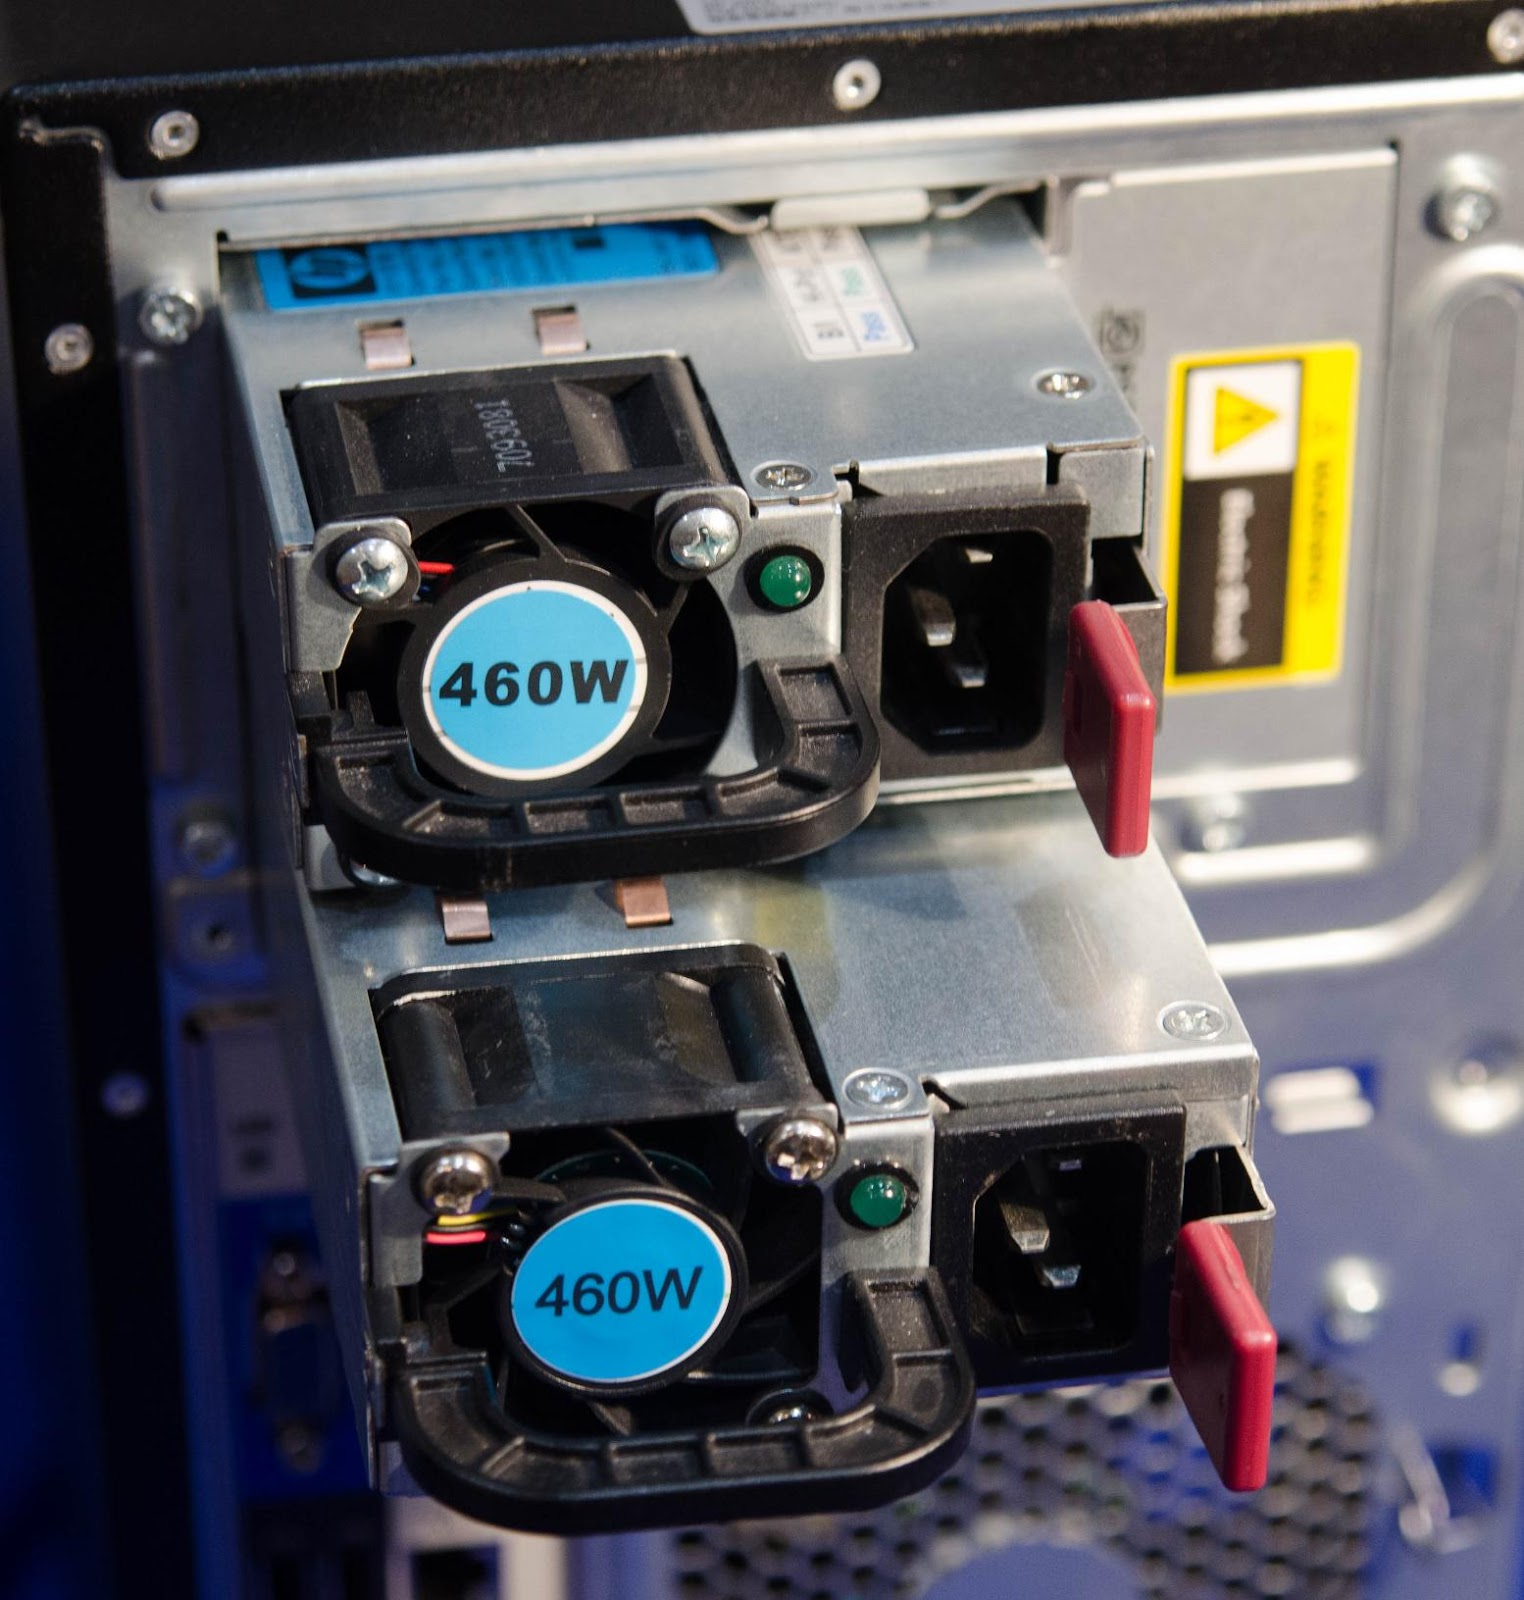 MаL, да удал: Обзор младших серверов линейки HPE ProLiant ML - 17